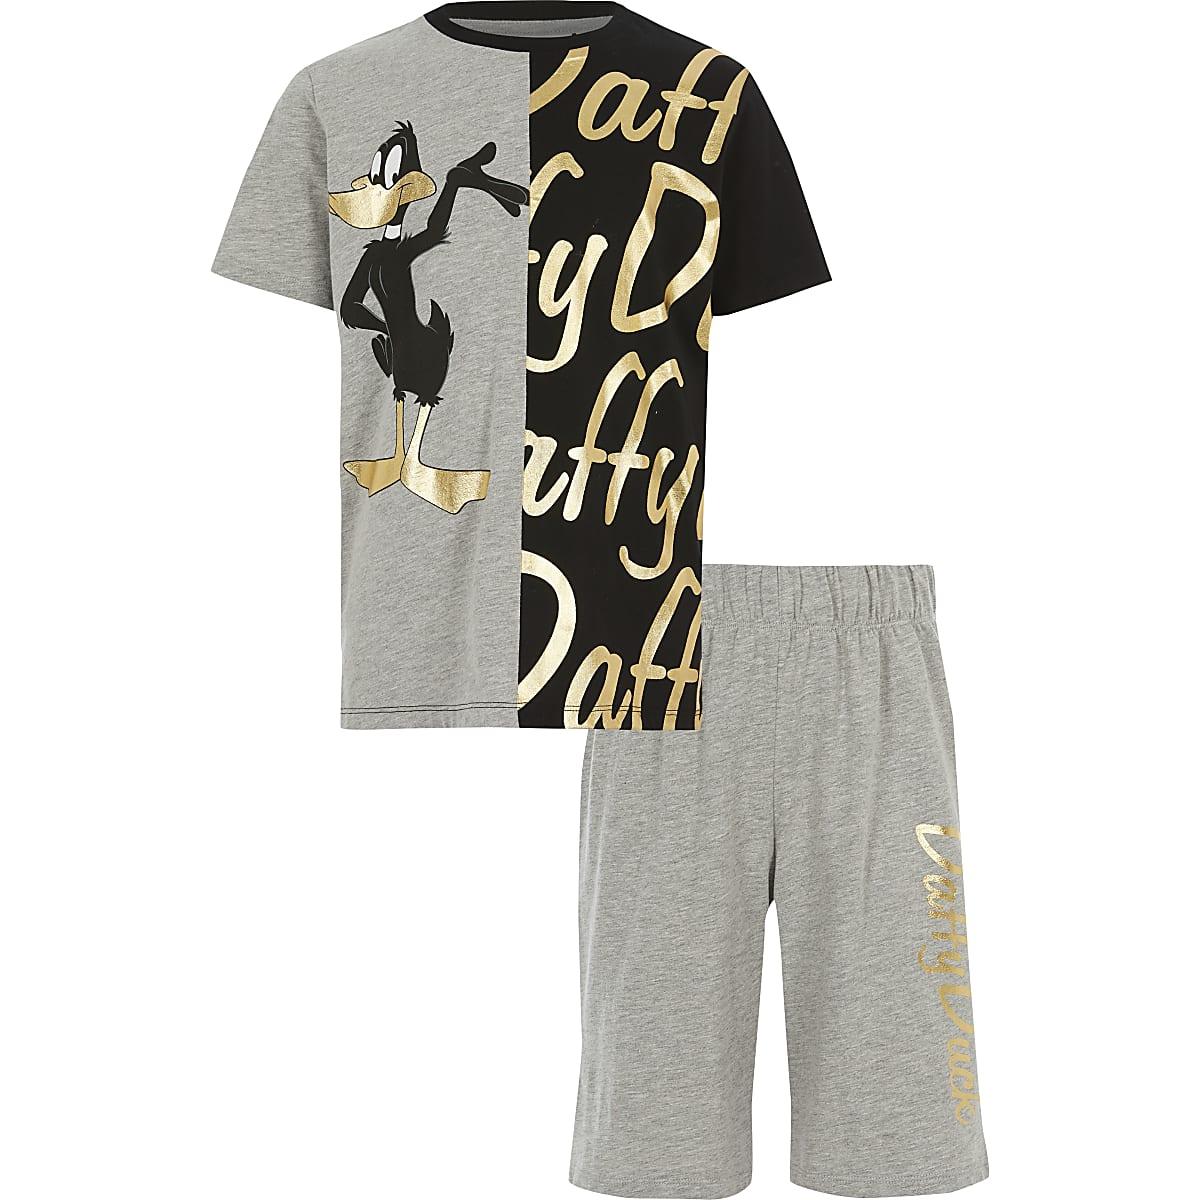 Boys grey Daffy Duck pyjama set